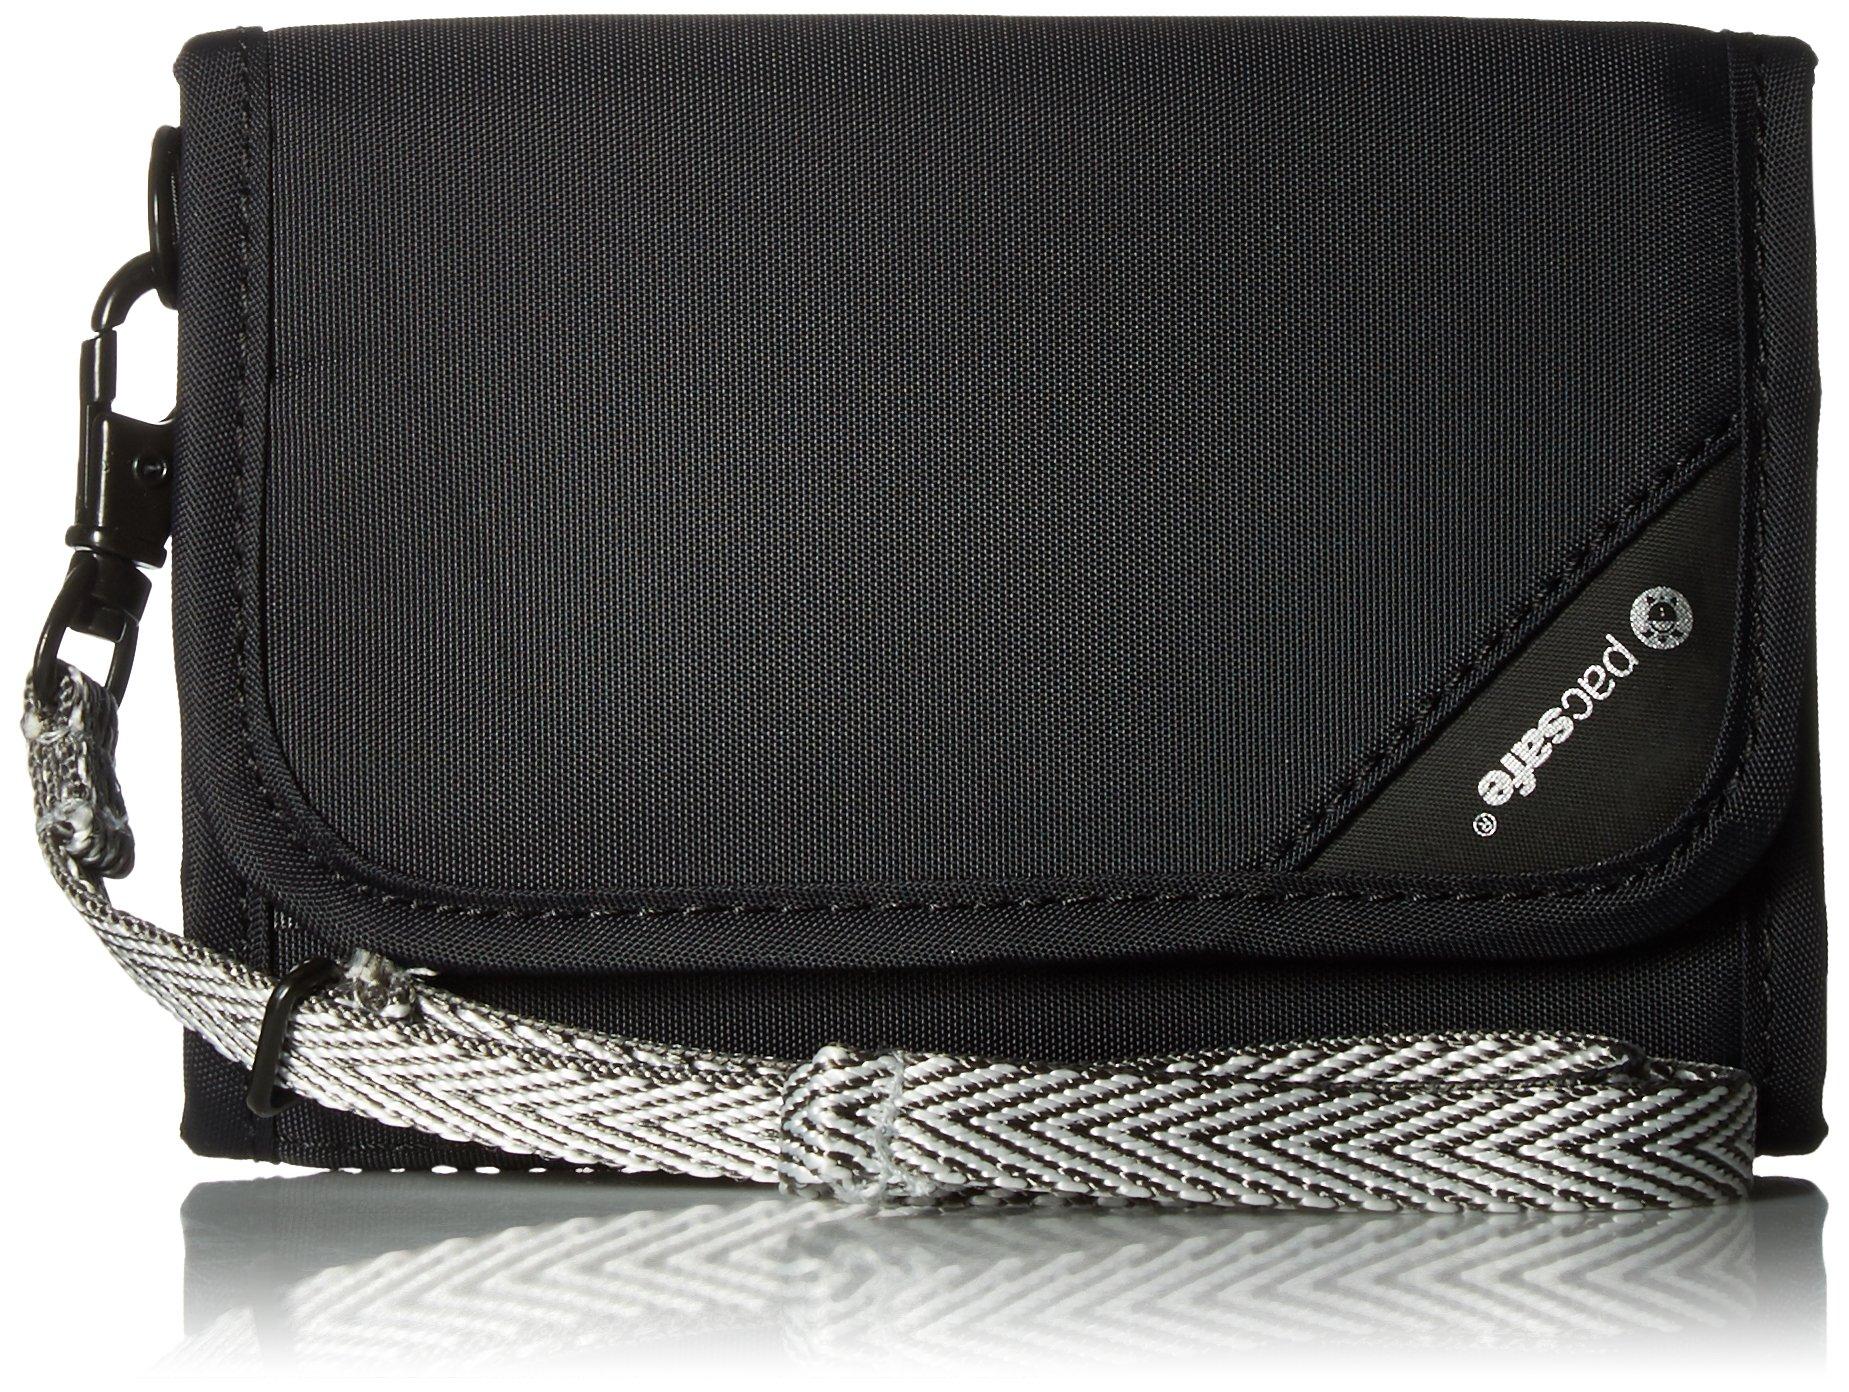 Pacsafe RFIDsafe V125 Anti-Theft RFID Blocking Tri-Fold Wallet, Black